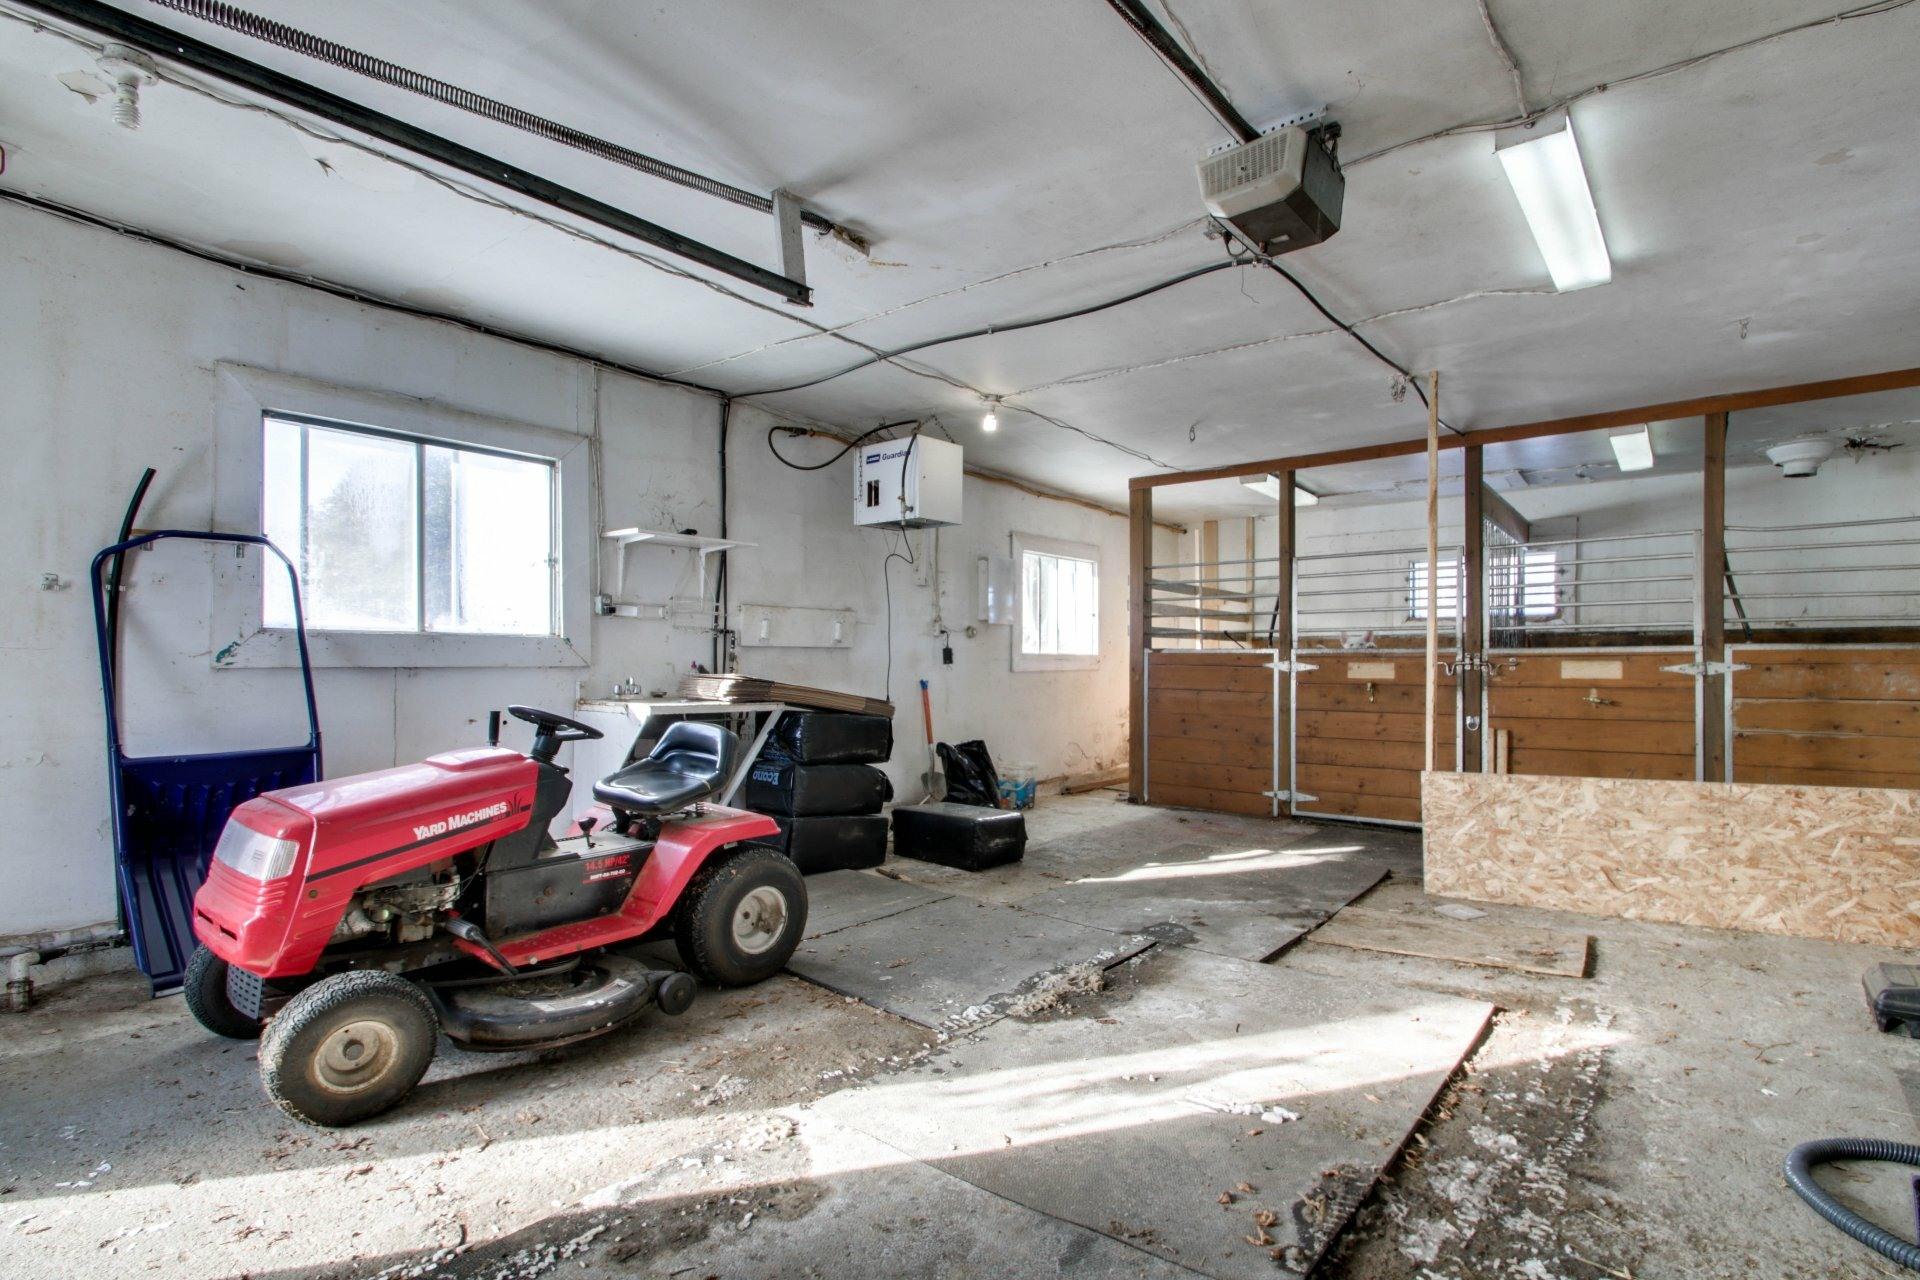 image 30 - Farmhouse For sale Sainte-Marie-de-Blandford - 8 rooms